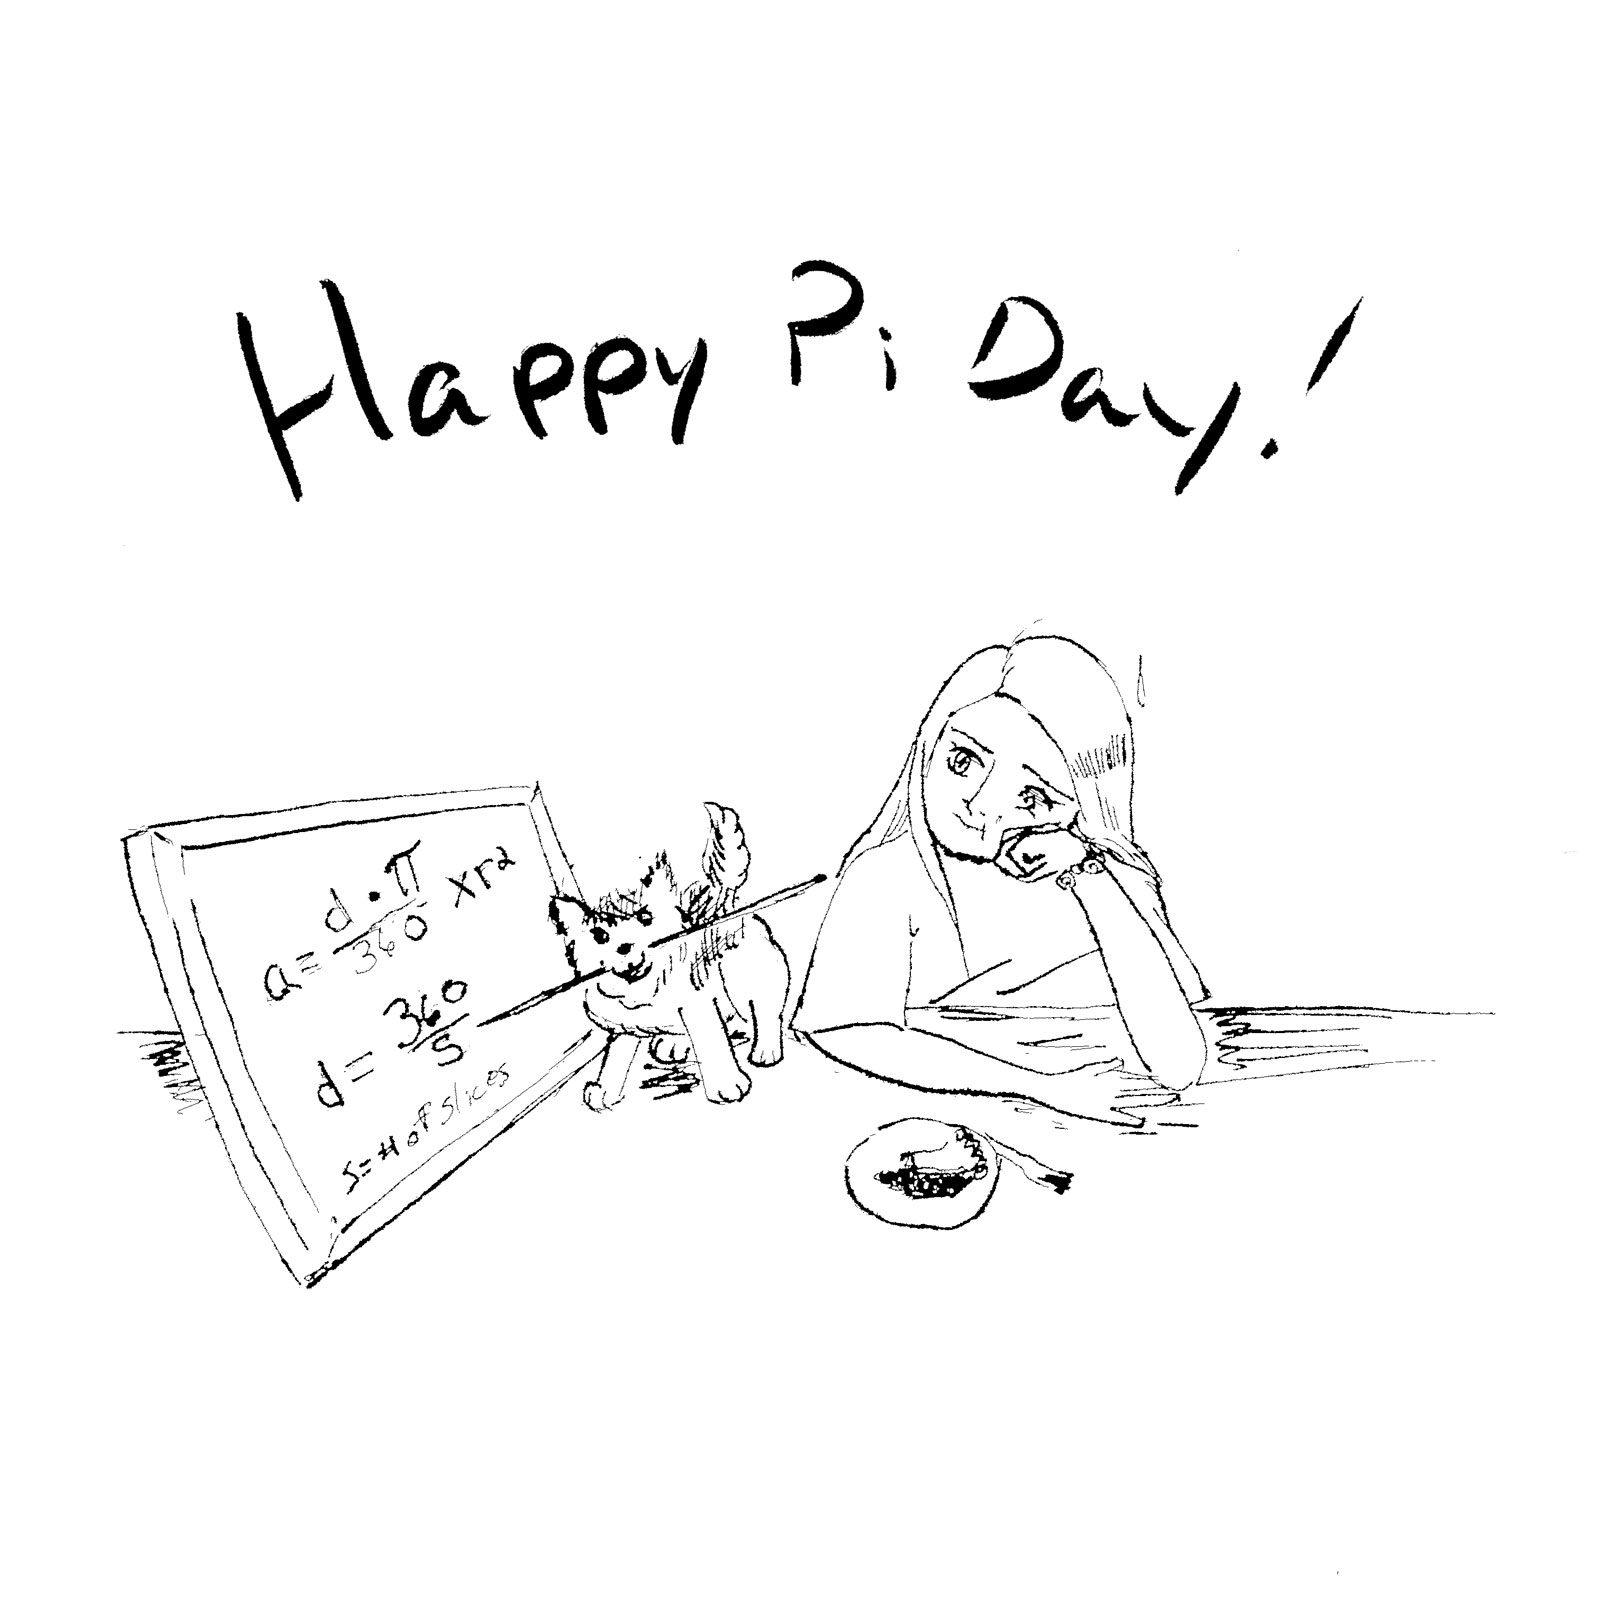 Happy Pi Day 2019